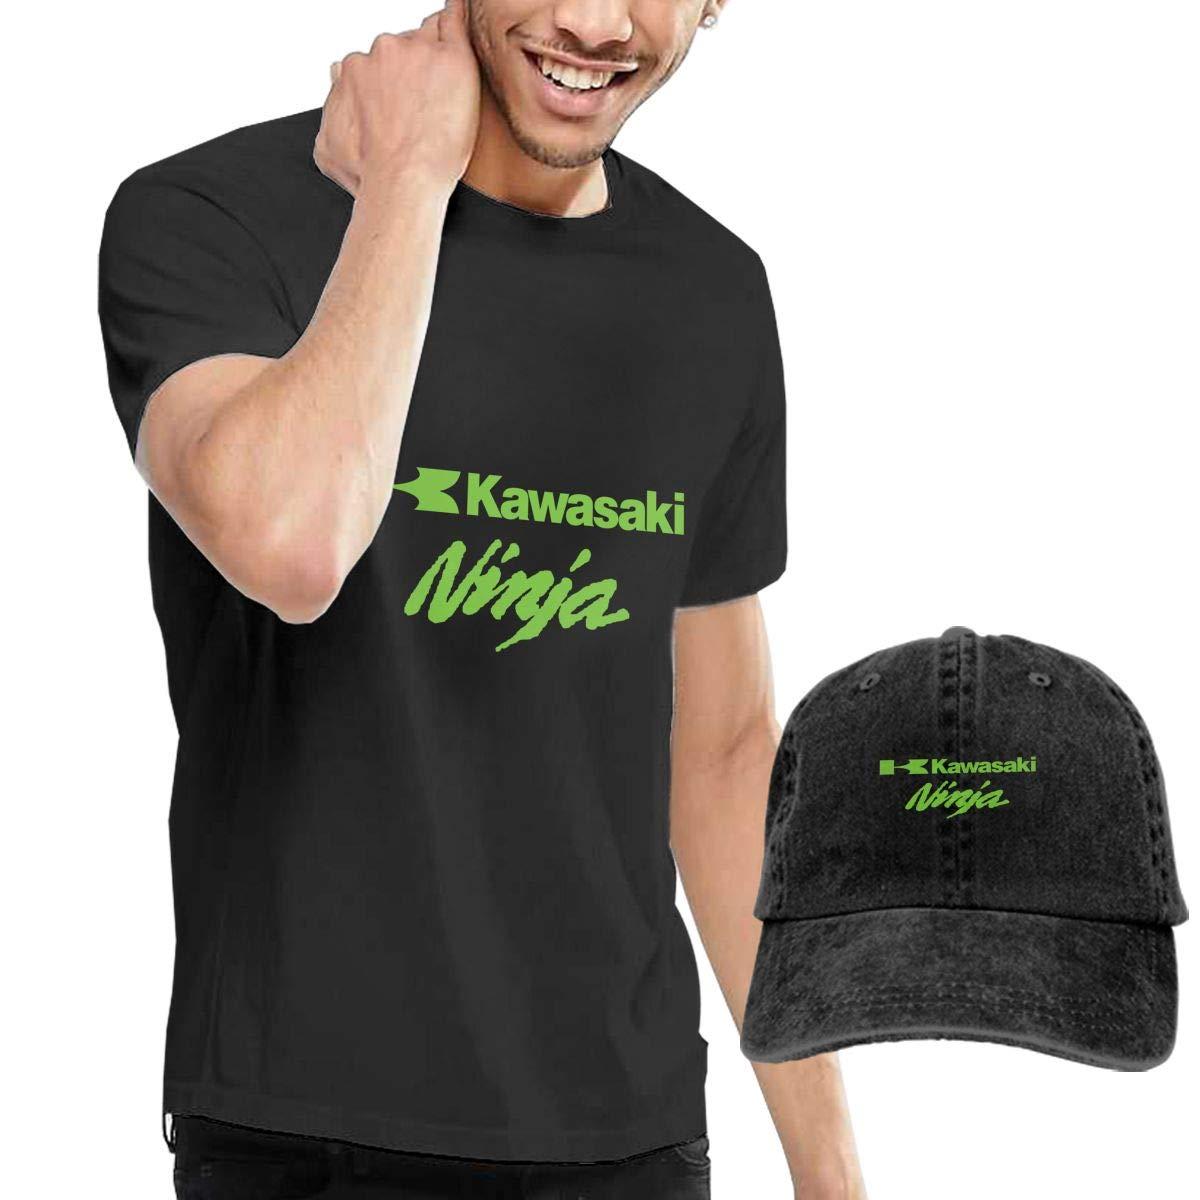 TIANXIN Personalized Vector Ninja Kawasaki Tshirts with Hats ...